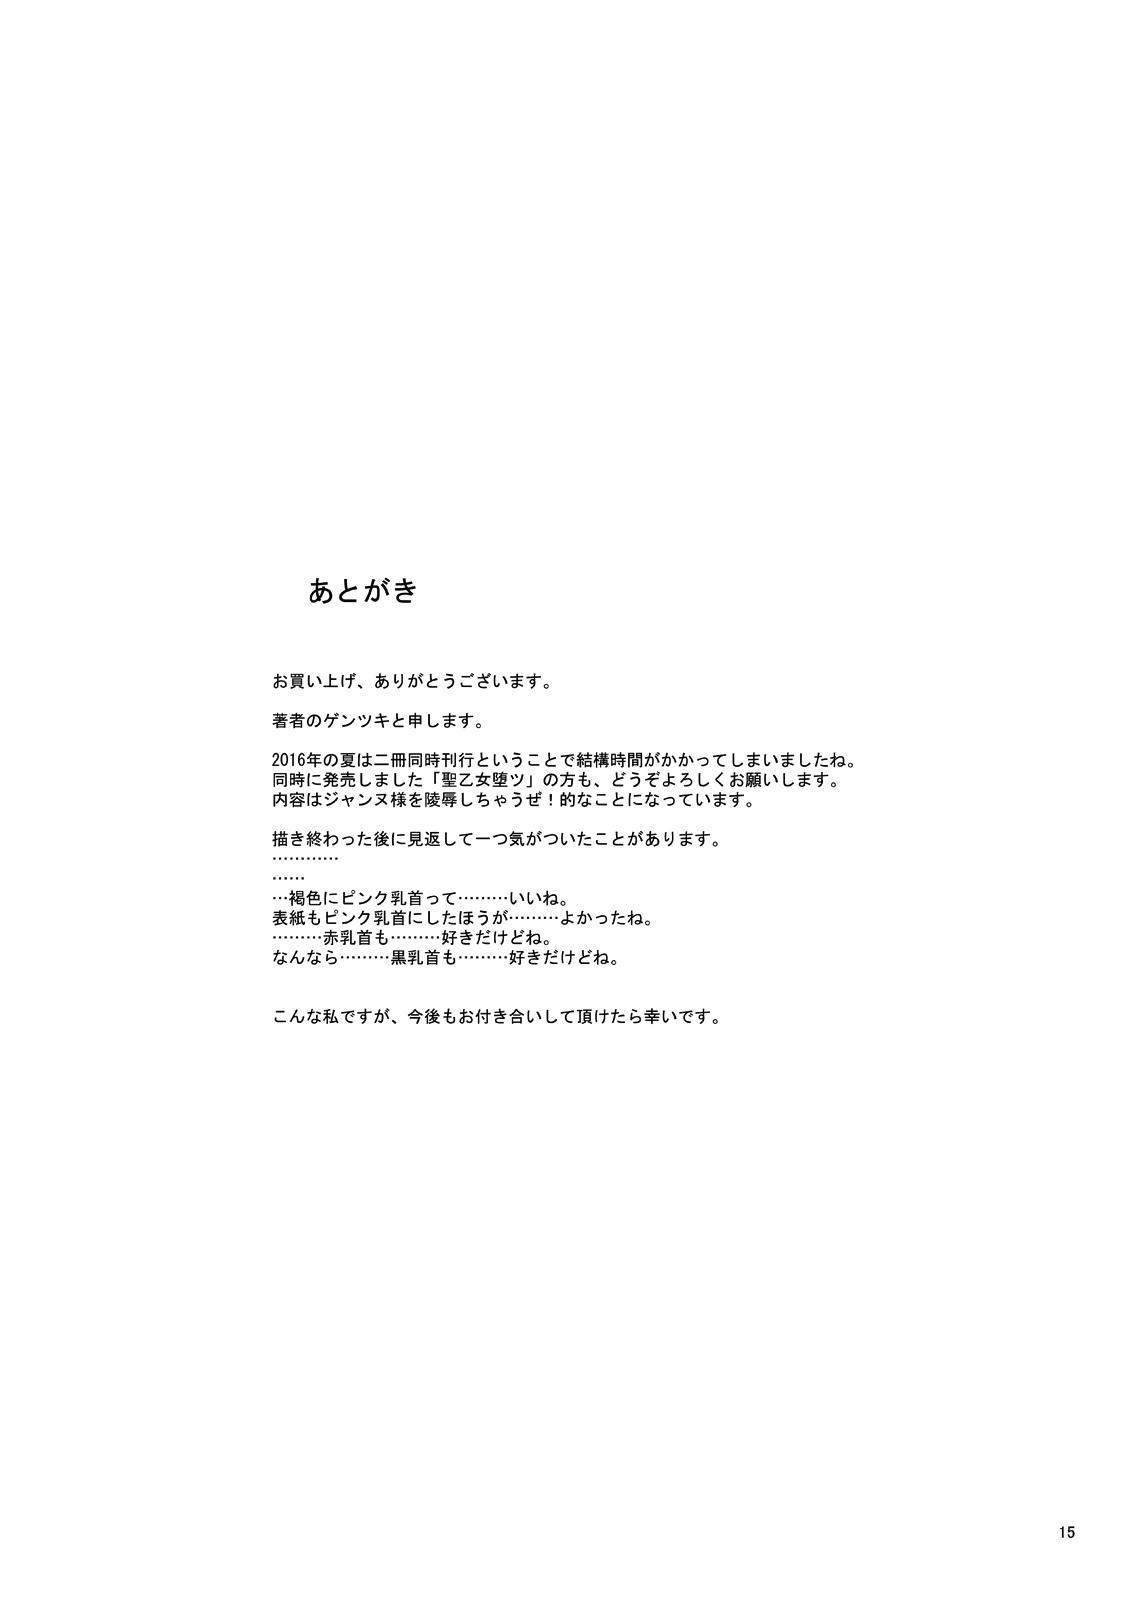 [Gentsuki Okiba (Gentsuki)] Zooey-chan to Nakayoku Shiyou | Cum Along with Zooey-chan (Granblue Fantasy) [English] [EHCOVE] [Digital] 16